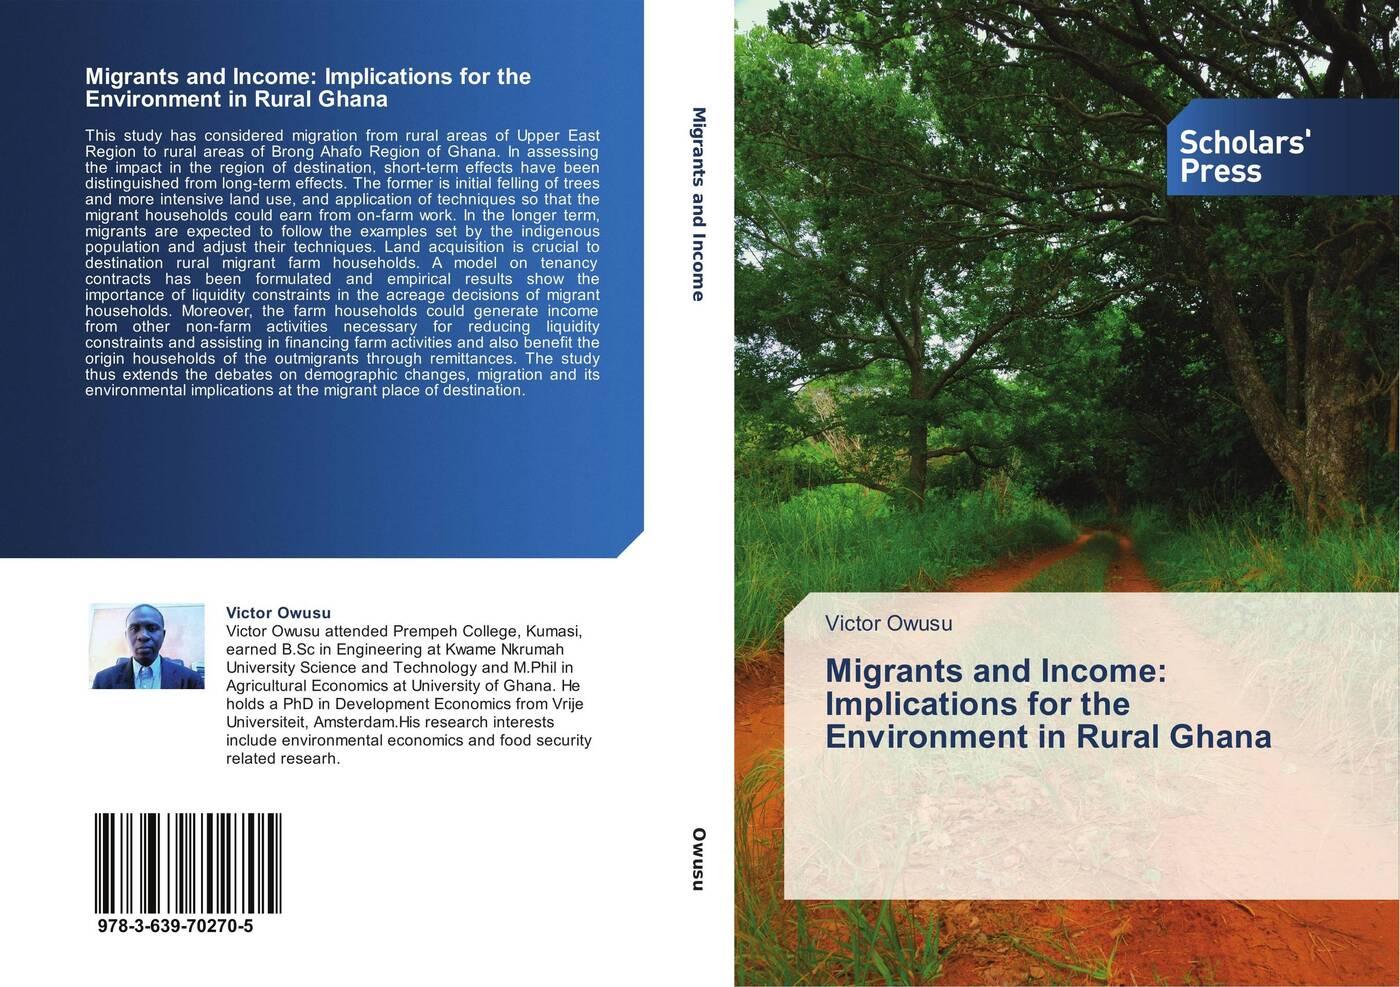 Victor Owusu Migrants and Income: Implications for the Environment in Rural Ghana цена в Москве и Питере